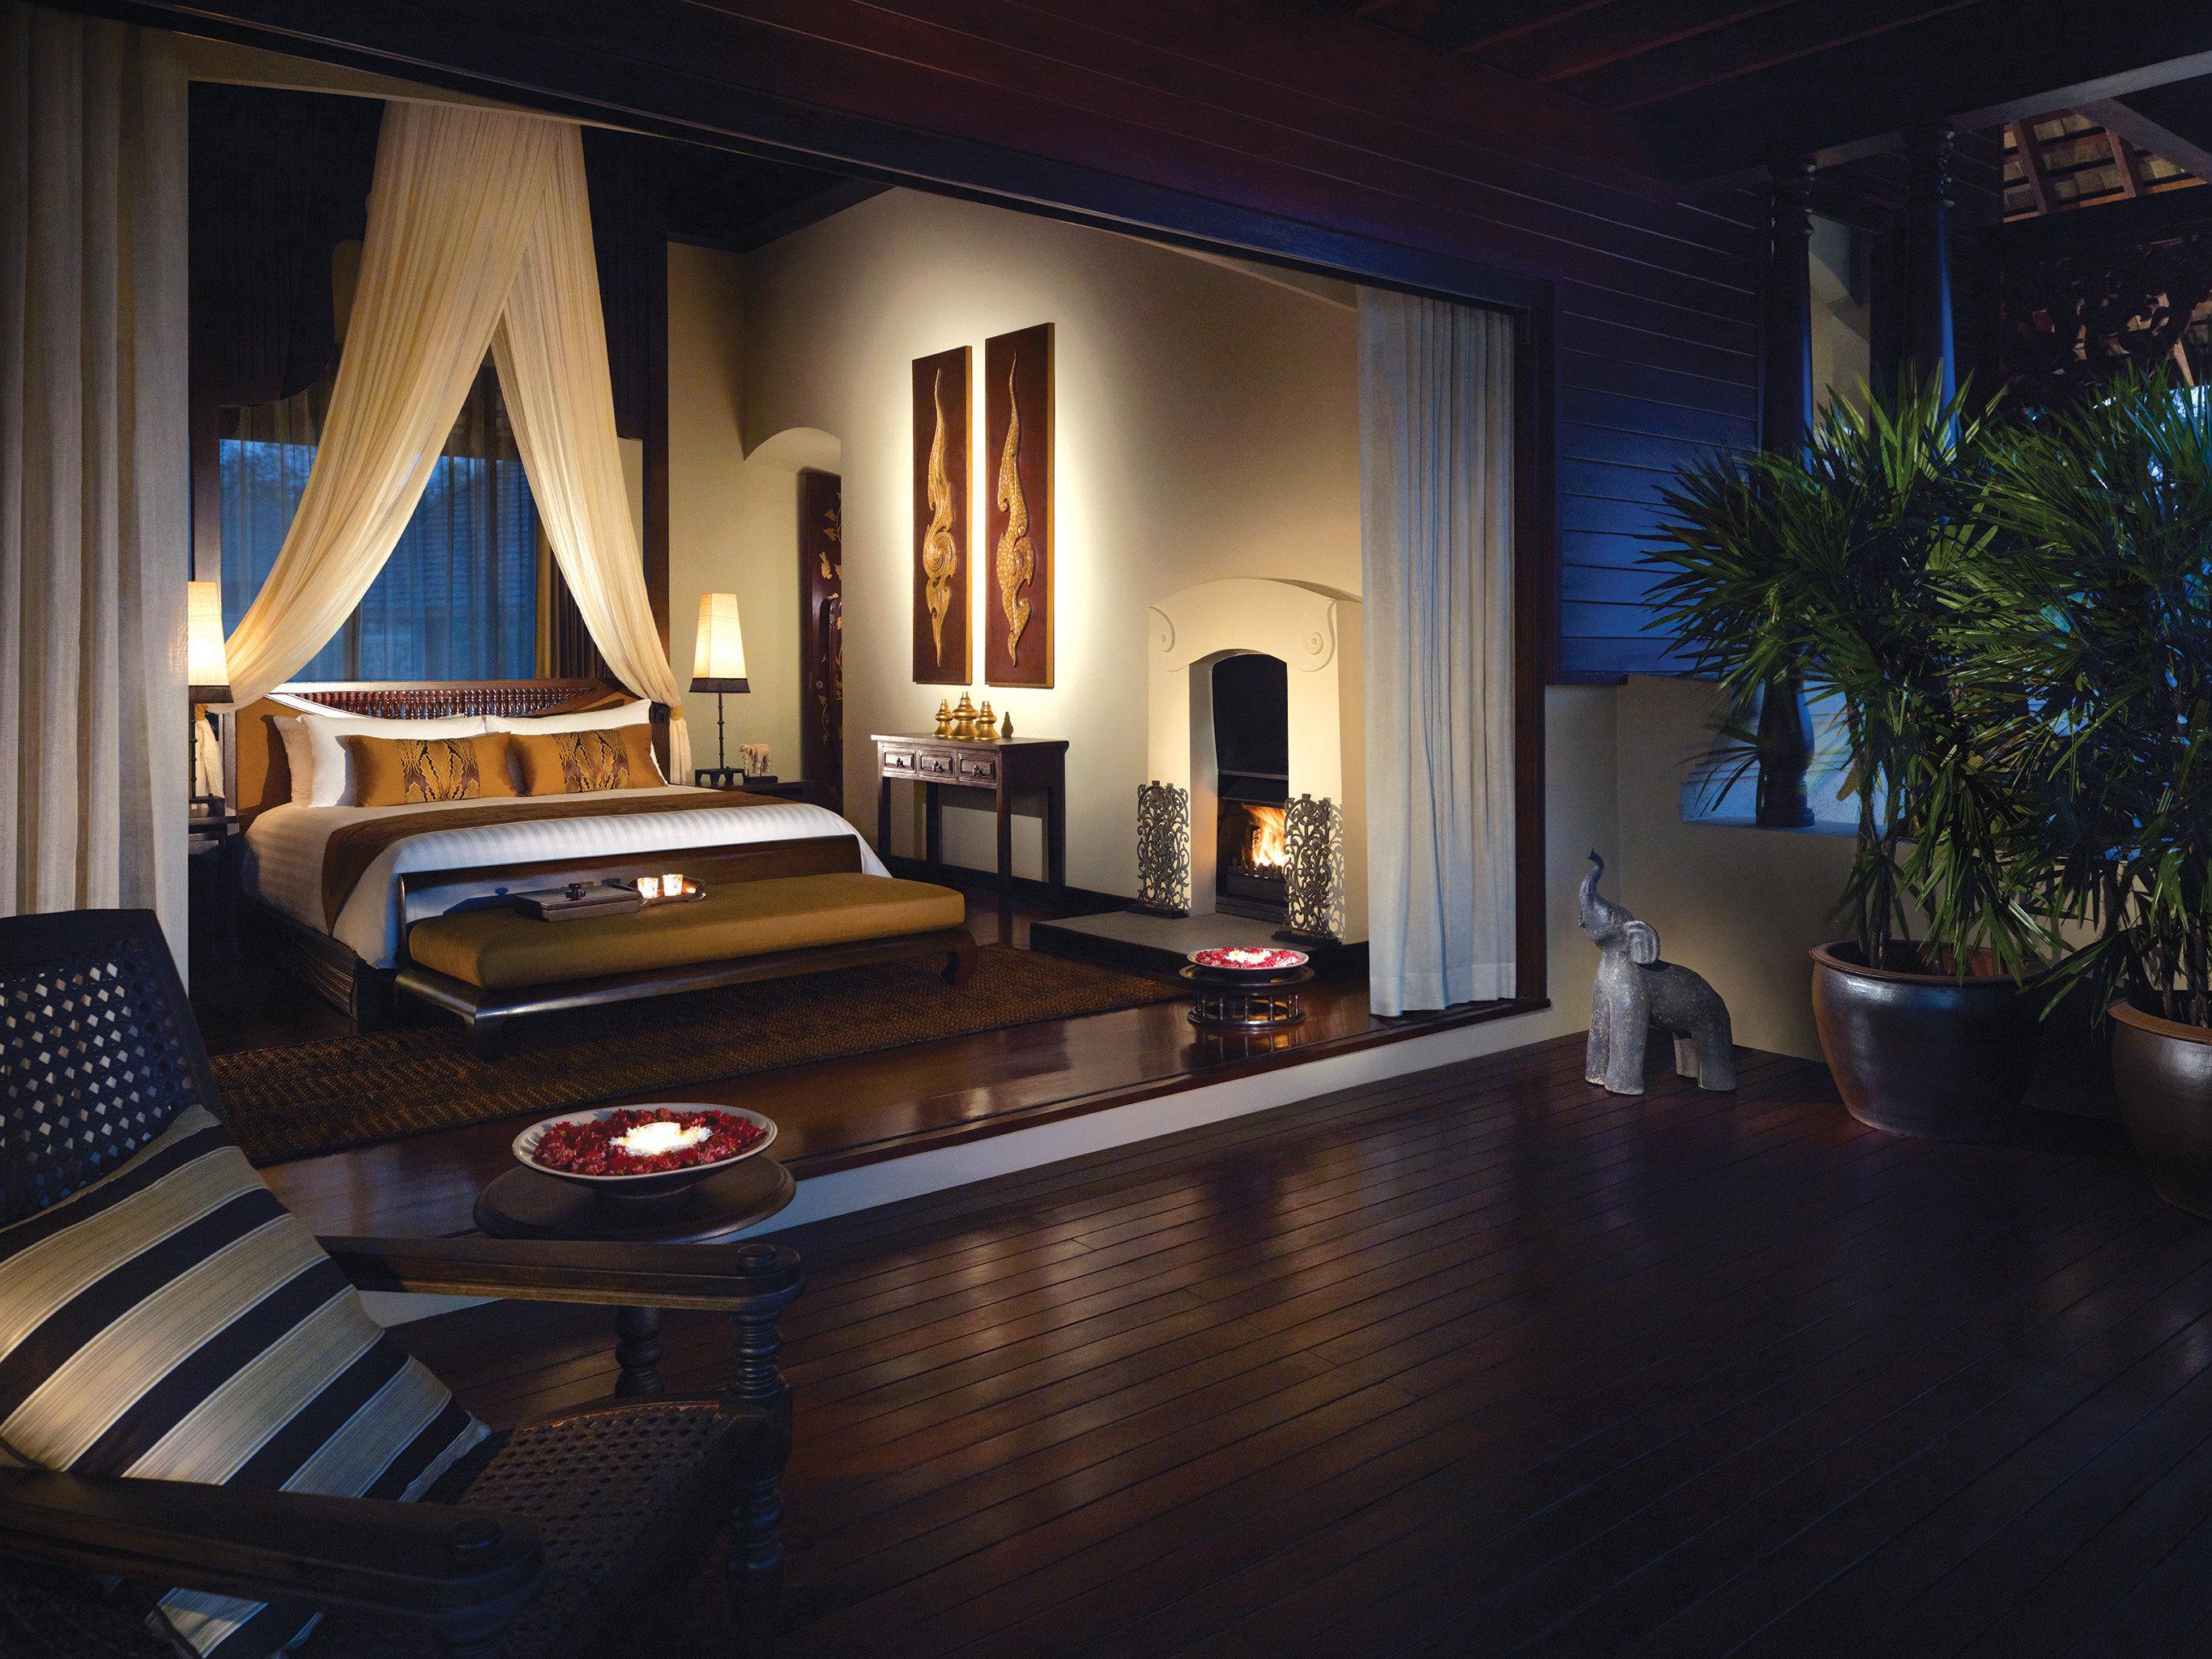 Balcony Bedroom Elegant Honeymoon Jungle Luxury Romance Romantic Suite Terrace Tropical property house home living room Lobby mansion Villa recreation room